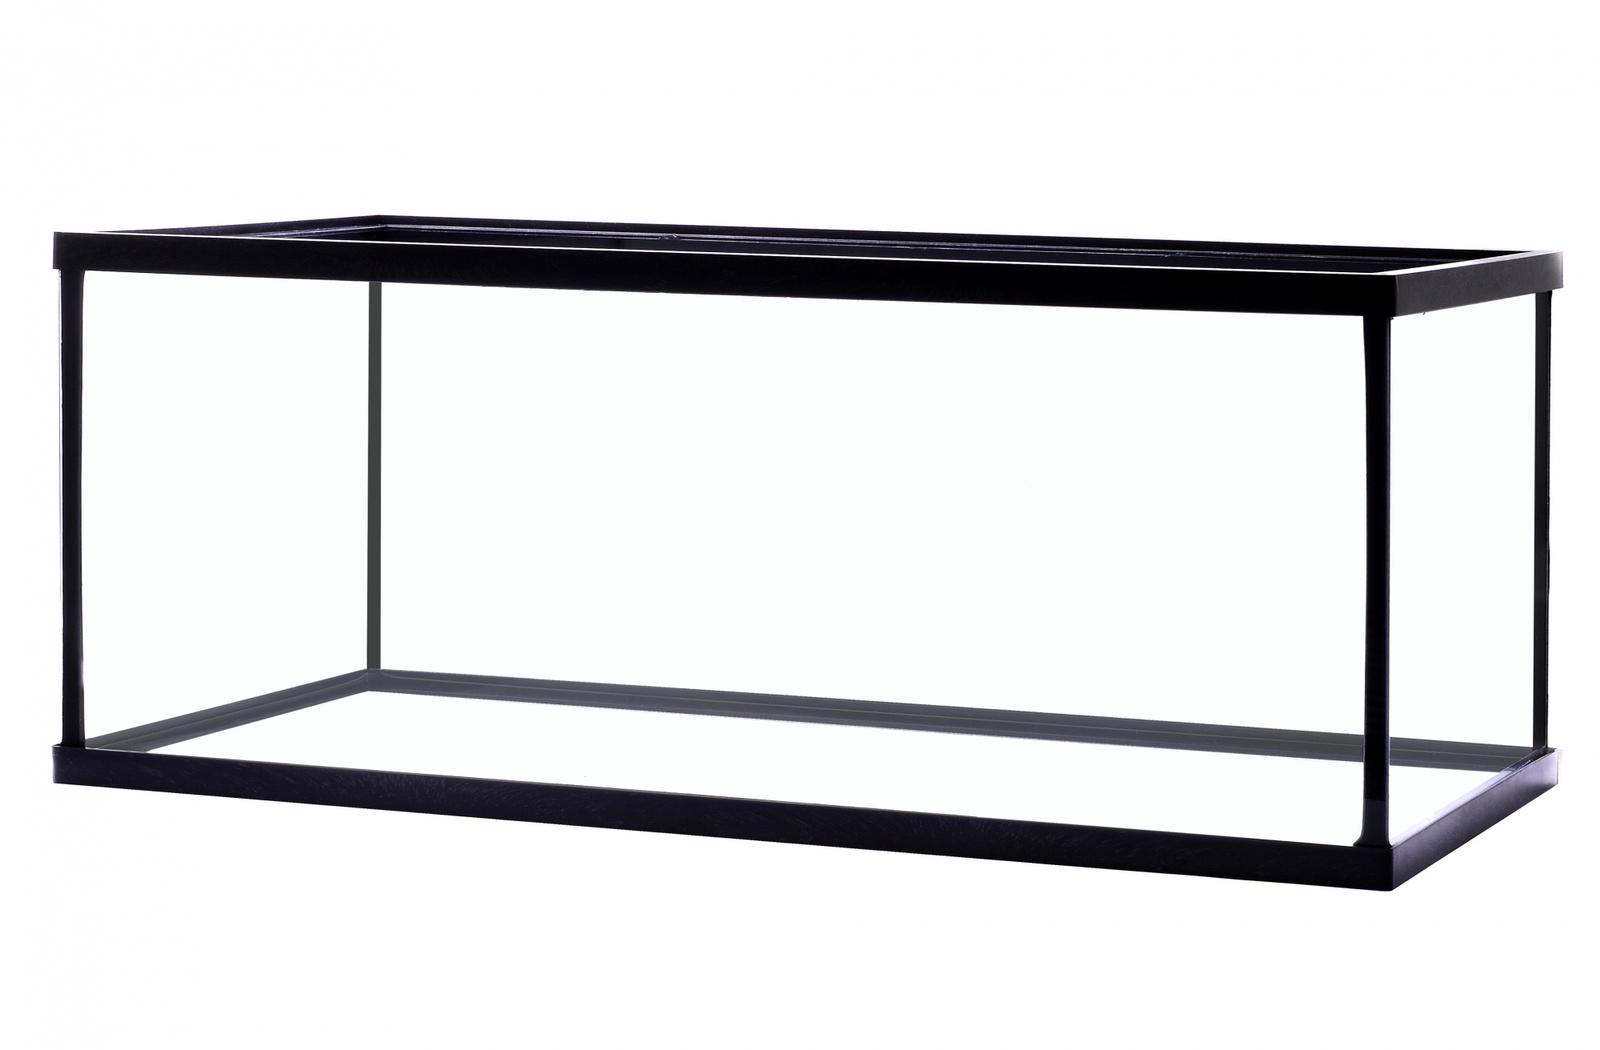 benelux Benelux Террариум для черепах стеклянный, 60 * 35 * 20 (Terrarium glas L) 4488 50511